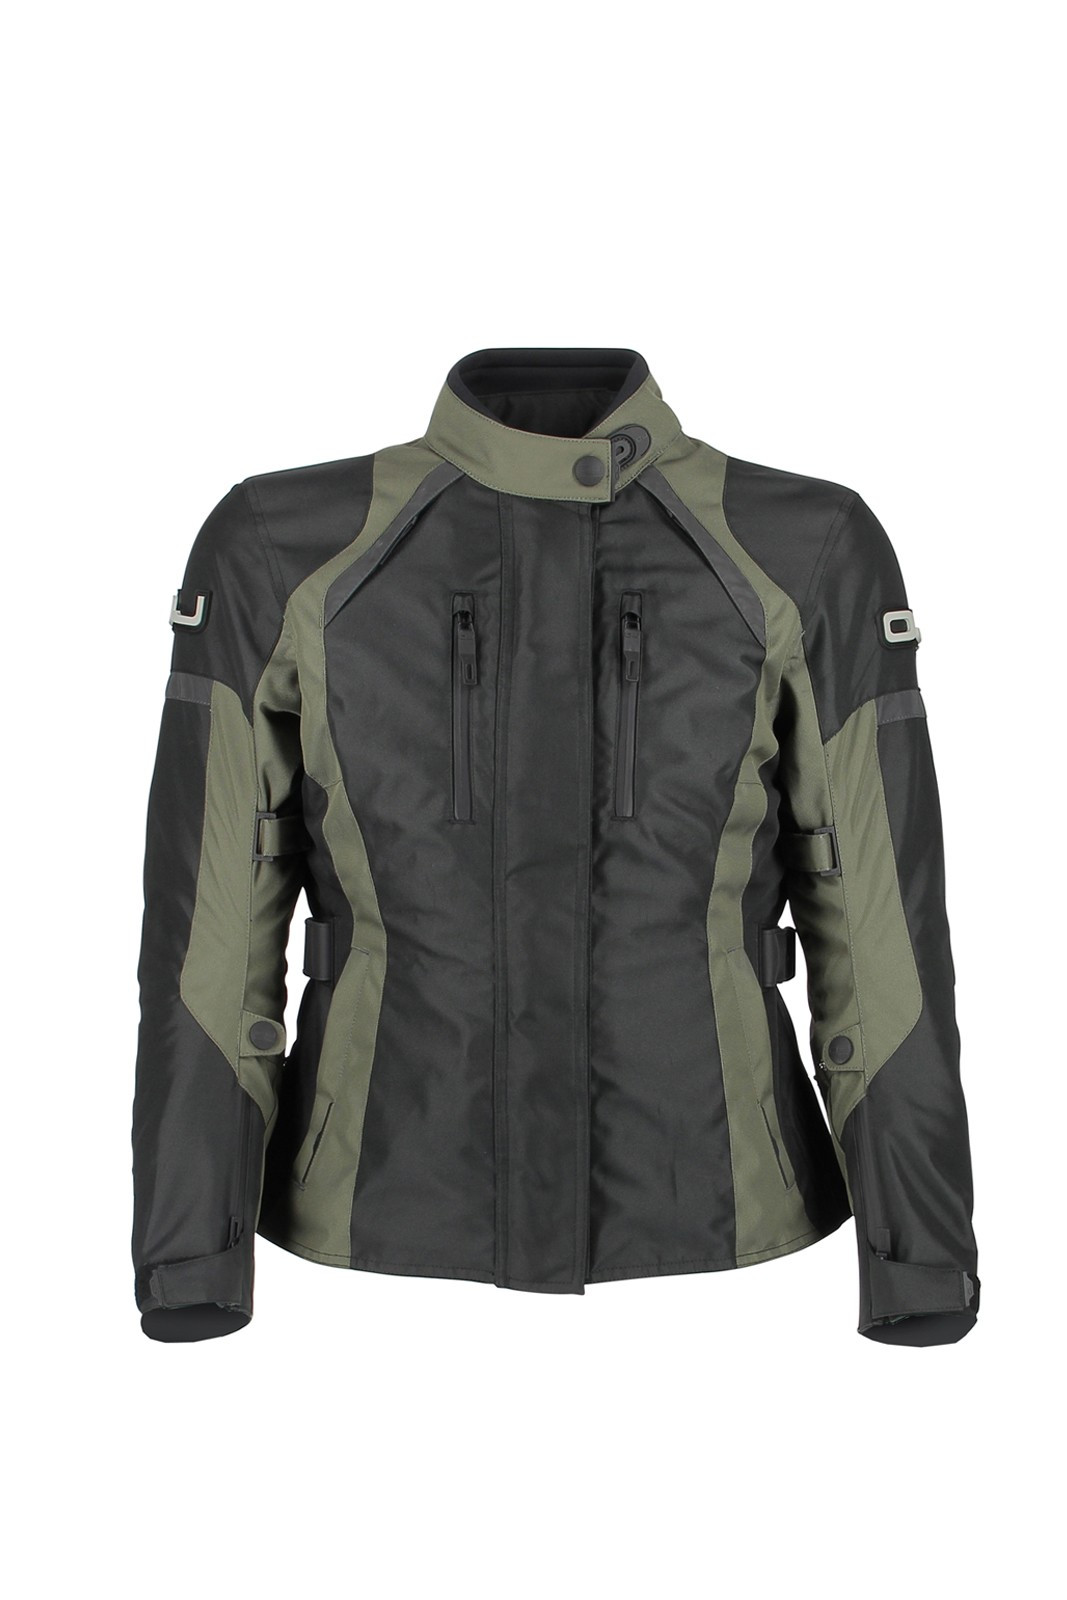 OJ Unstoppable Lady jacket dark green